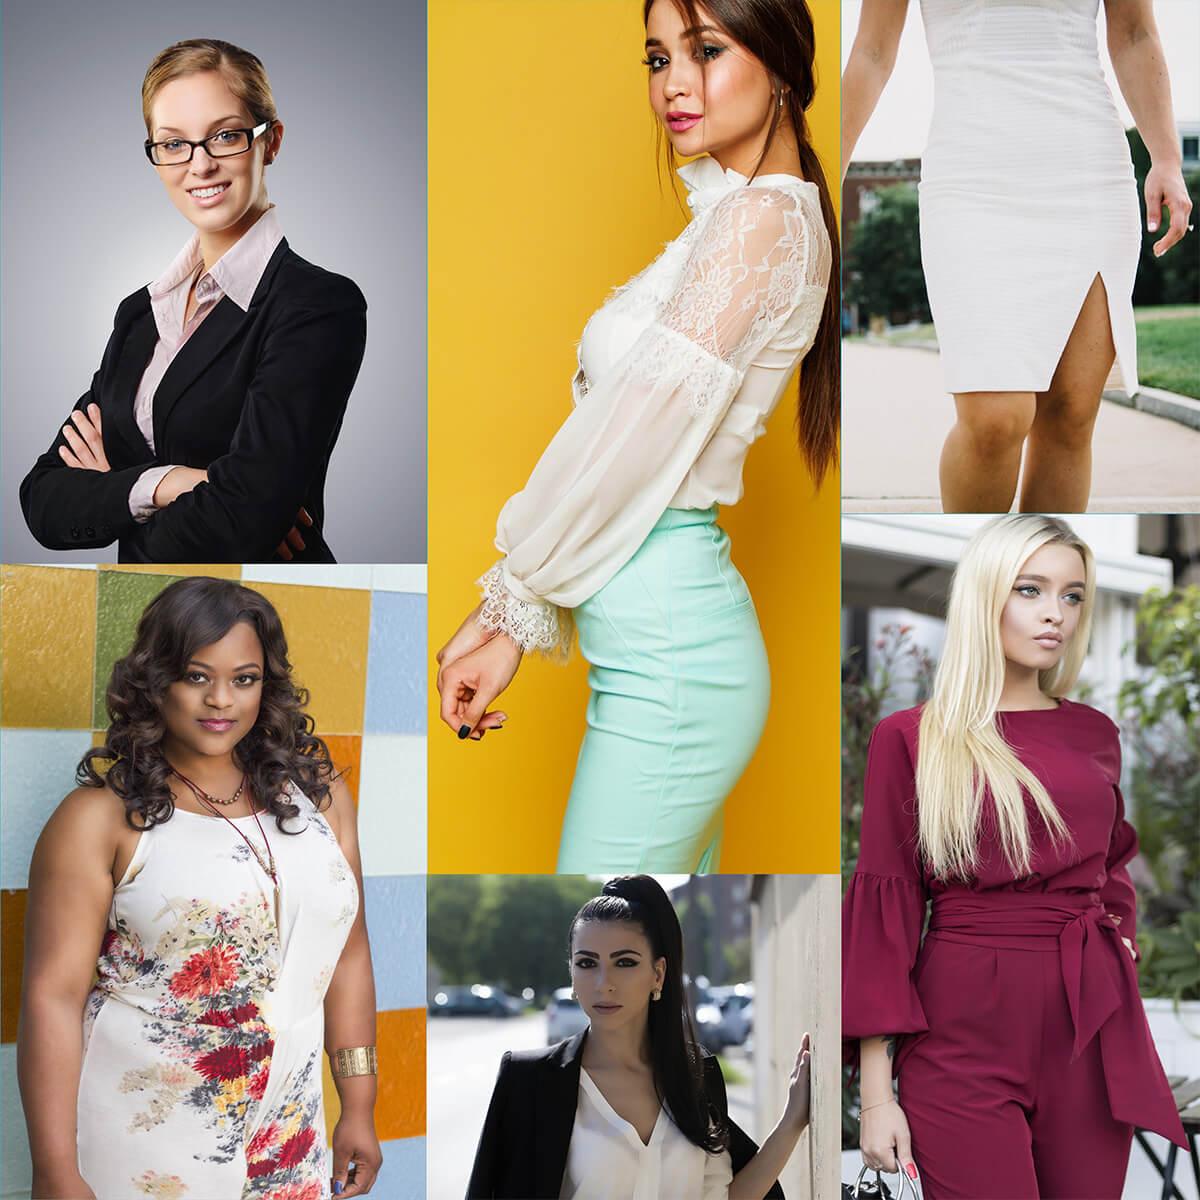 miss perfect shapewear damen - unterhemd bauchweg hemd mit bügel (s-xxl)  body shaper damen shaping unterwäsche damen top - nahtlos & formend